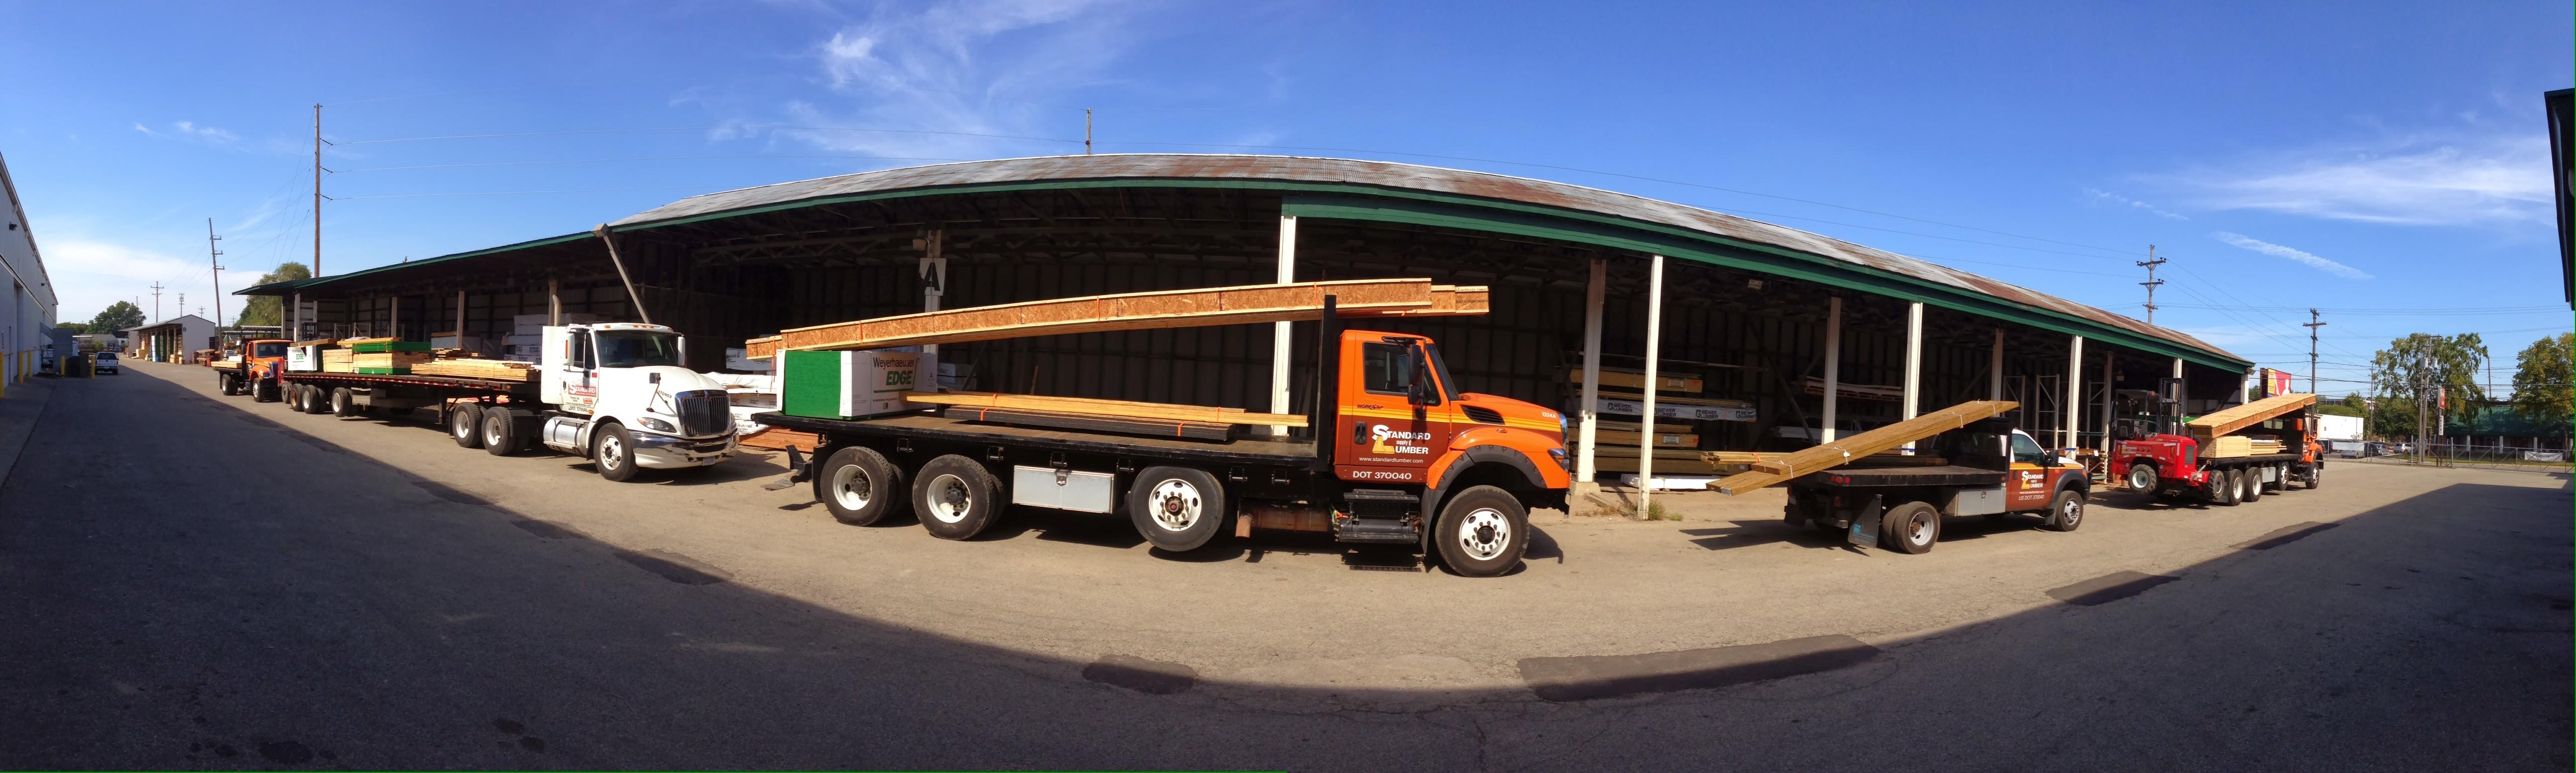 Standard Supply & Lumber - A Division of US LBM | LinkedIn